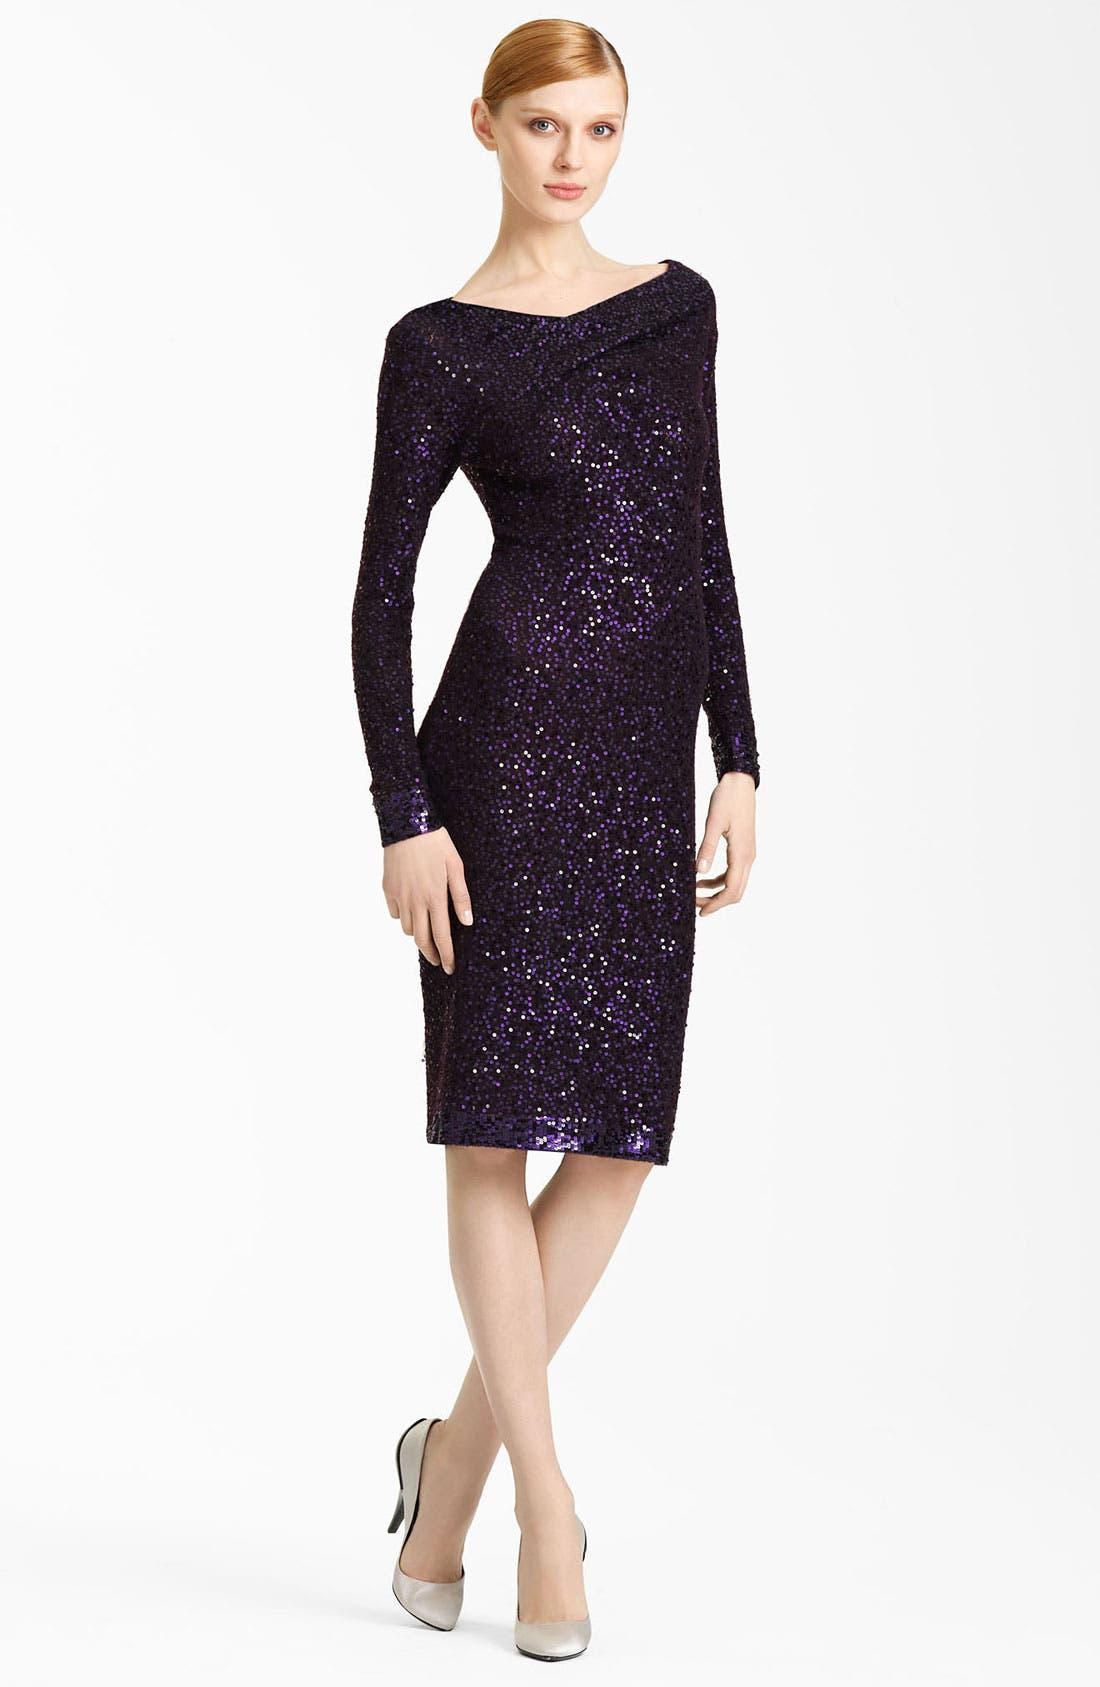 Alternate Image 1 Selected - Donna Karan Collection Sequin Dress